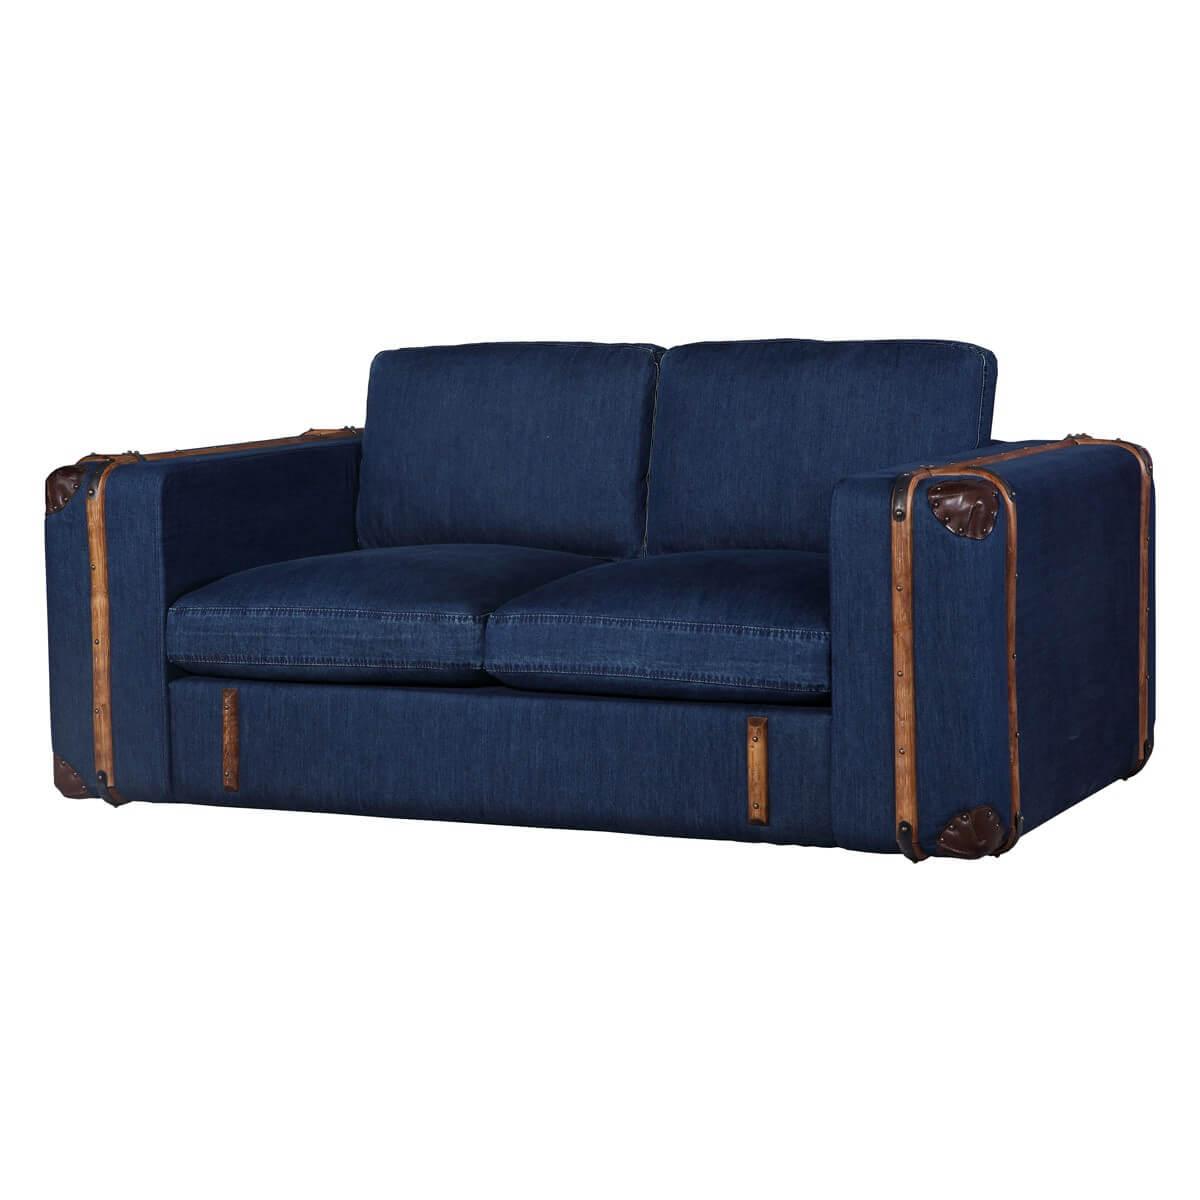 Sofa Grena 2-Sitzer in Jeansstoff Blau